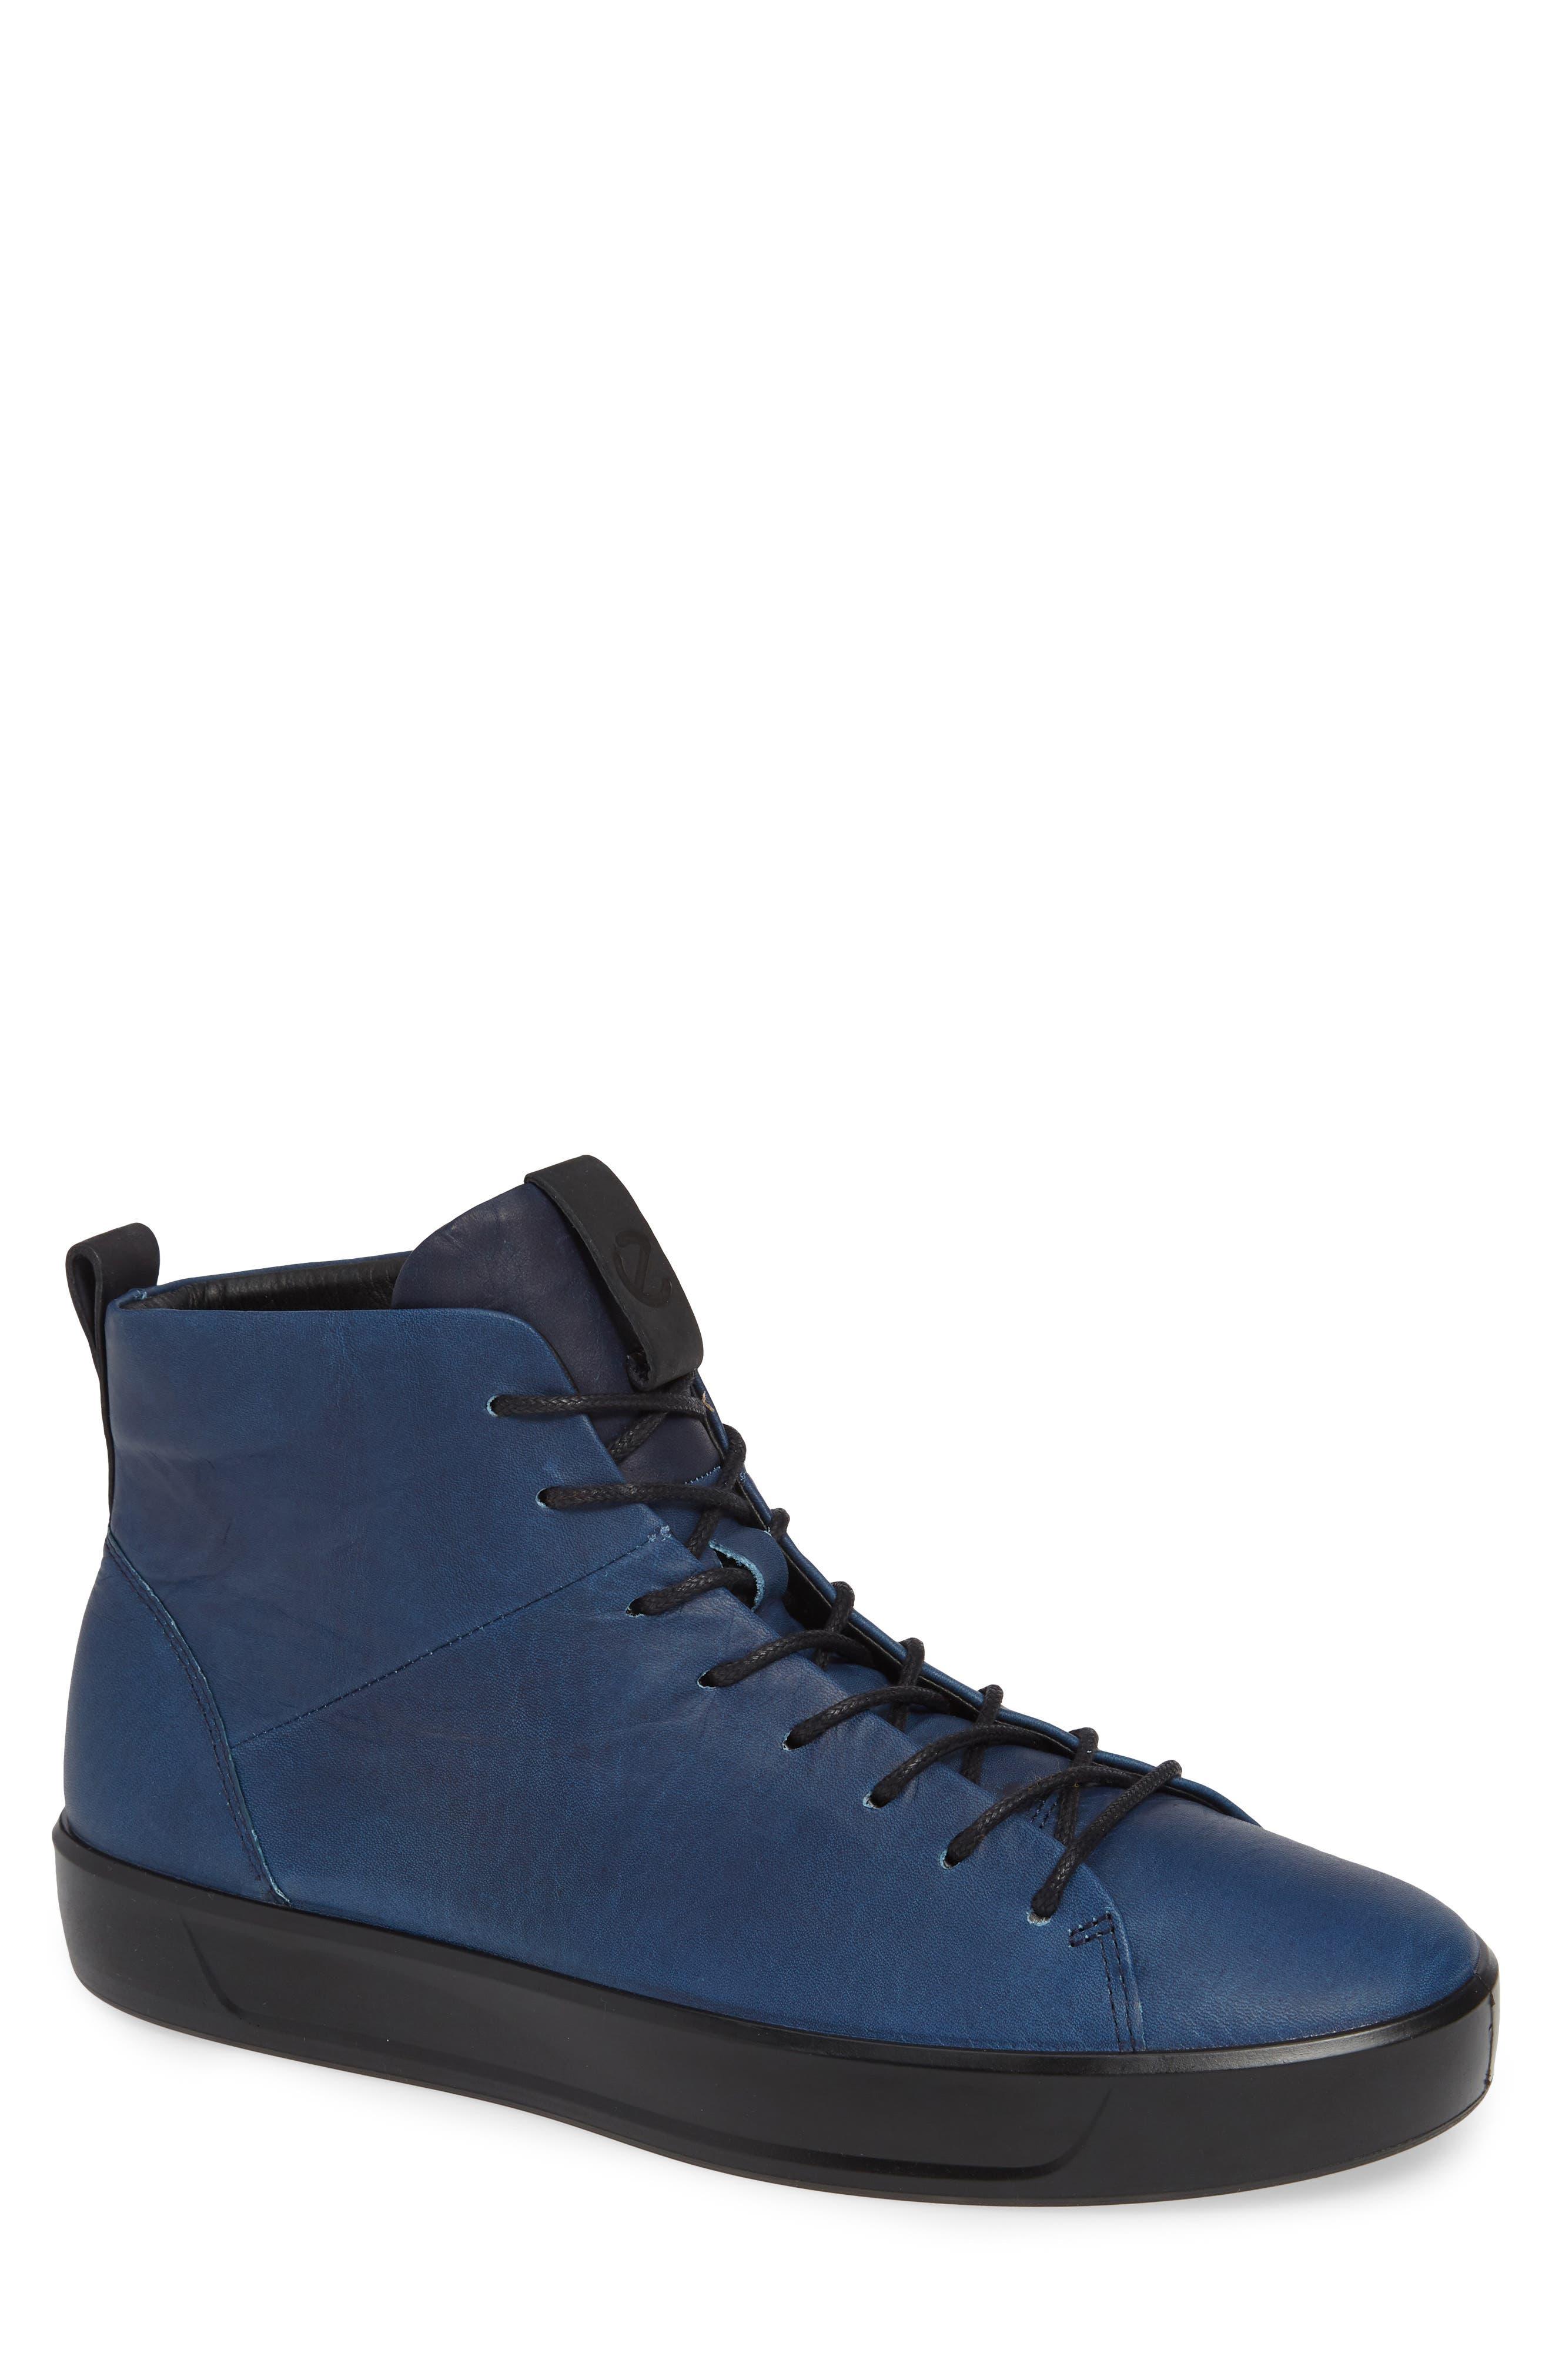 Soft 8 Sneaker,                             Main thumbnail 1, color,                             INDIGO LEATHER